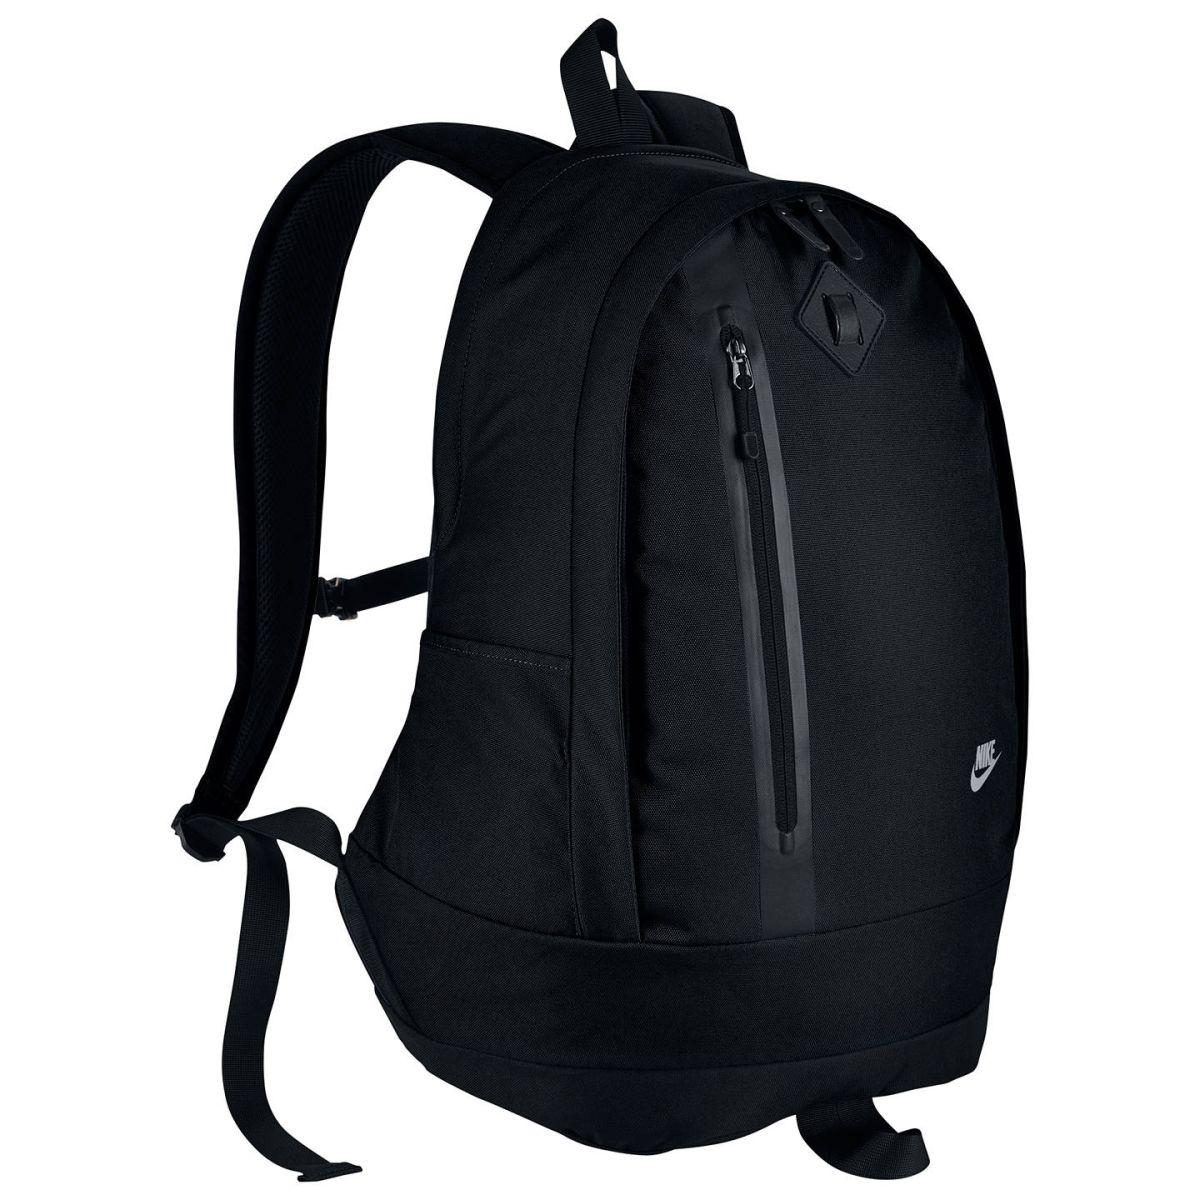 Nike backpacks: 8 essential styles for school, college or